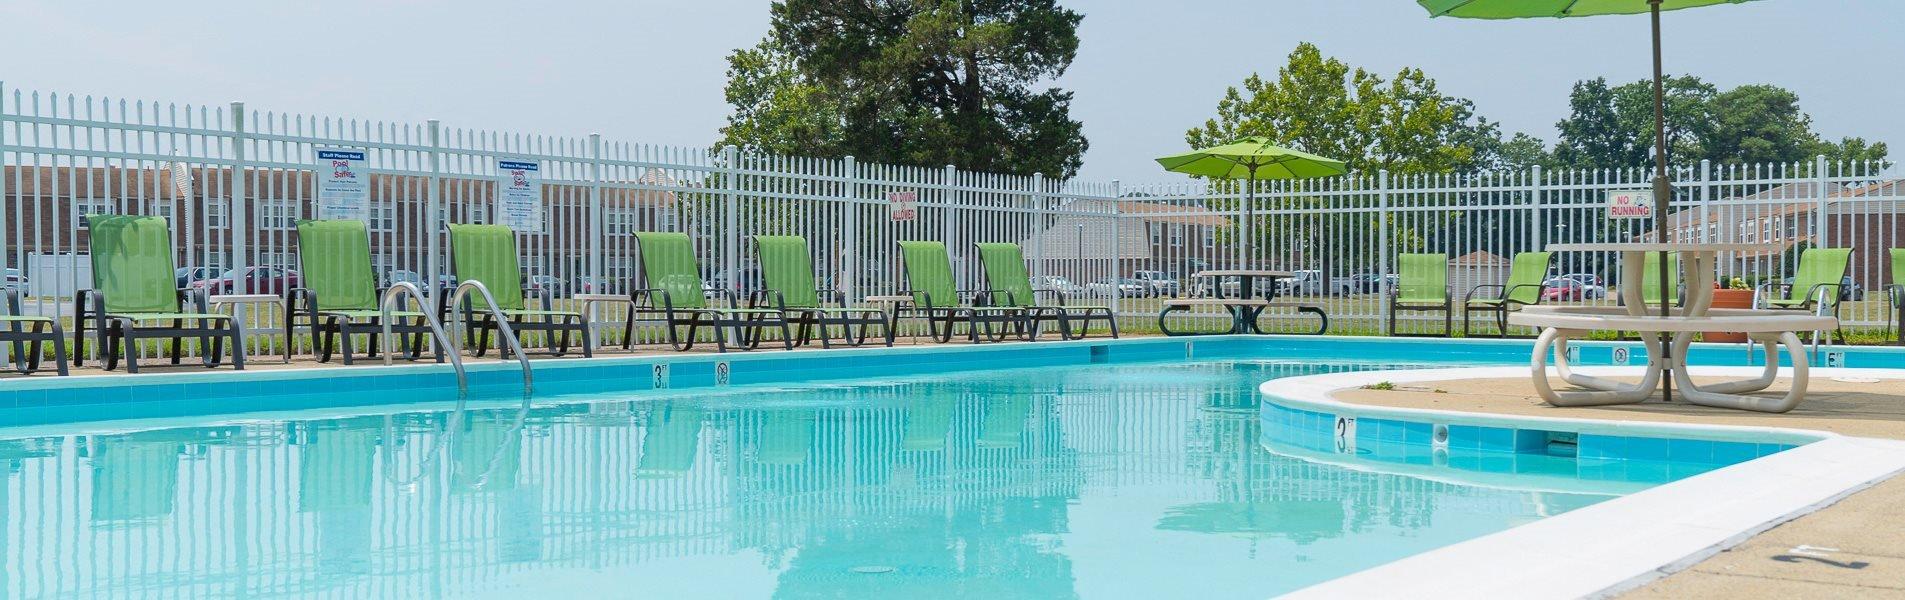 banner-pool  at Warwick Villages Apartments in Newport News VA